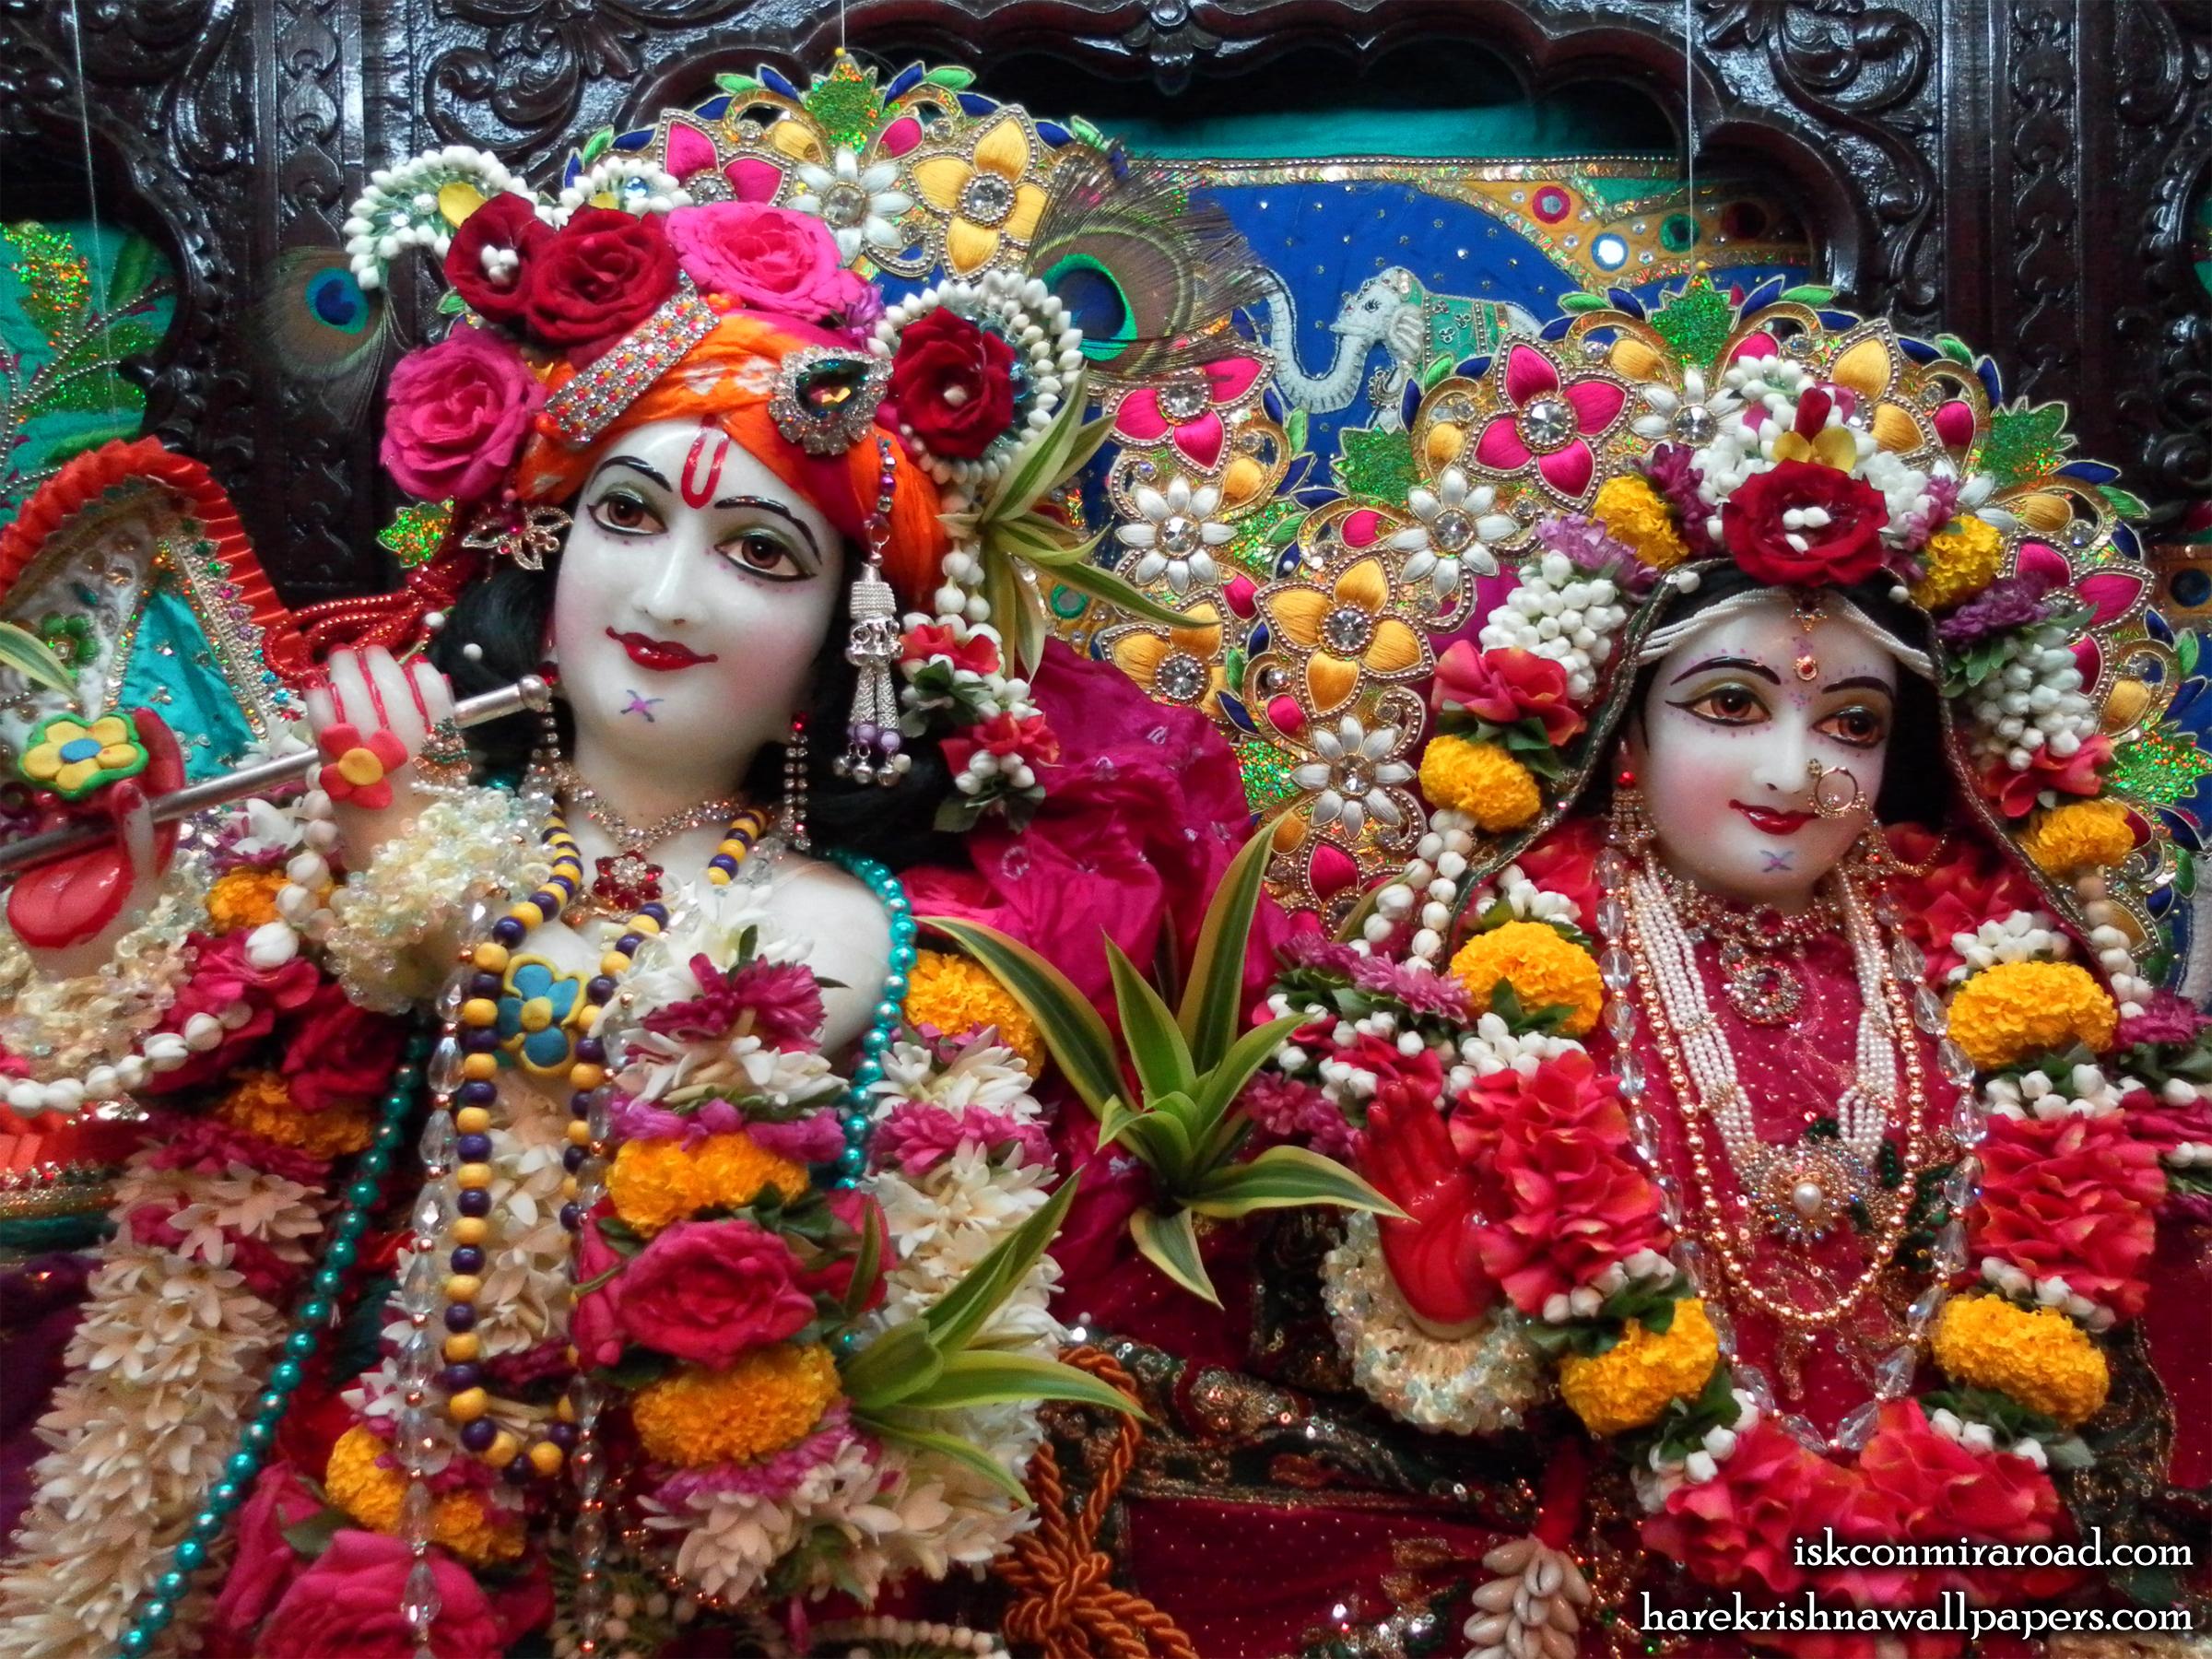 Sri Sri Radha Giridhari Close up Wallpaper (003) Size 2400x1800 Download